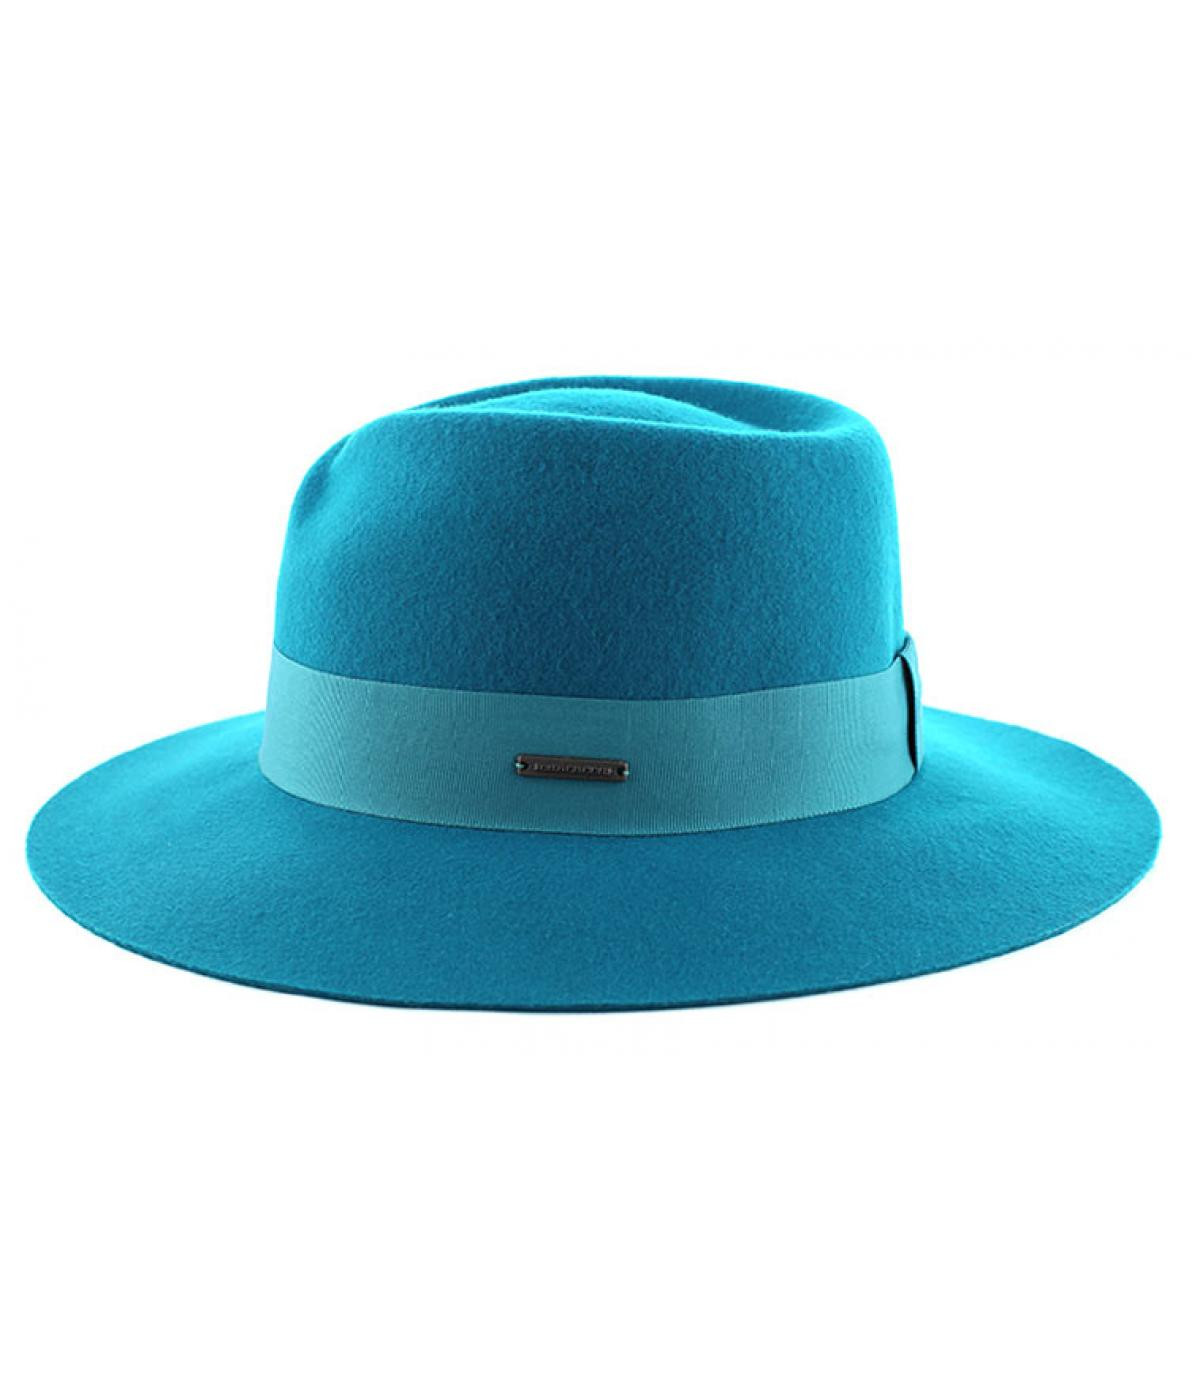 Cappello donna fedora blu